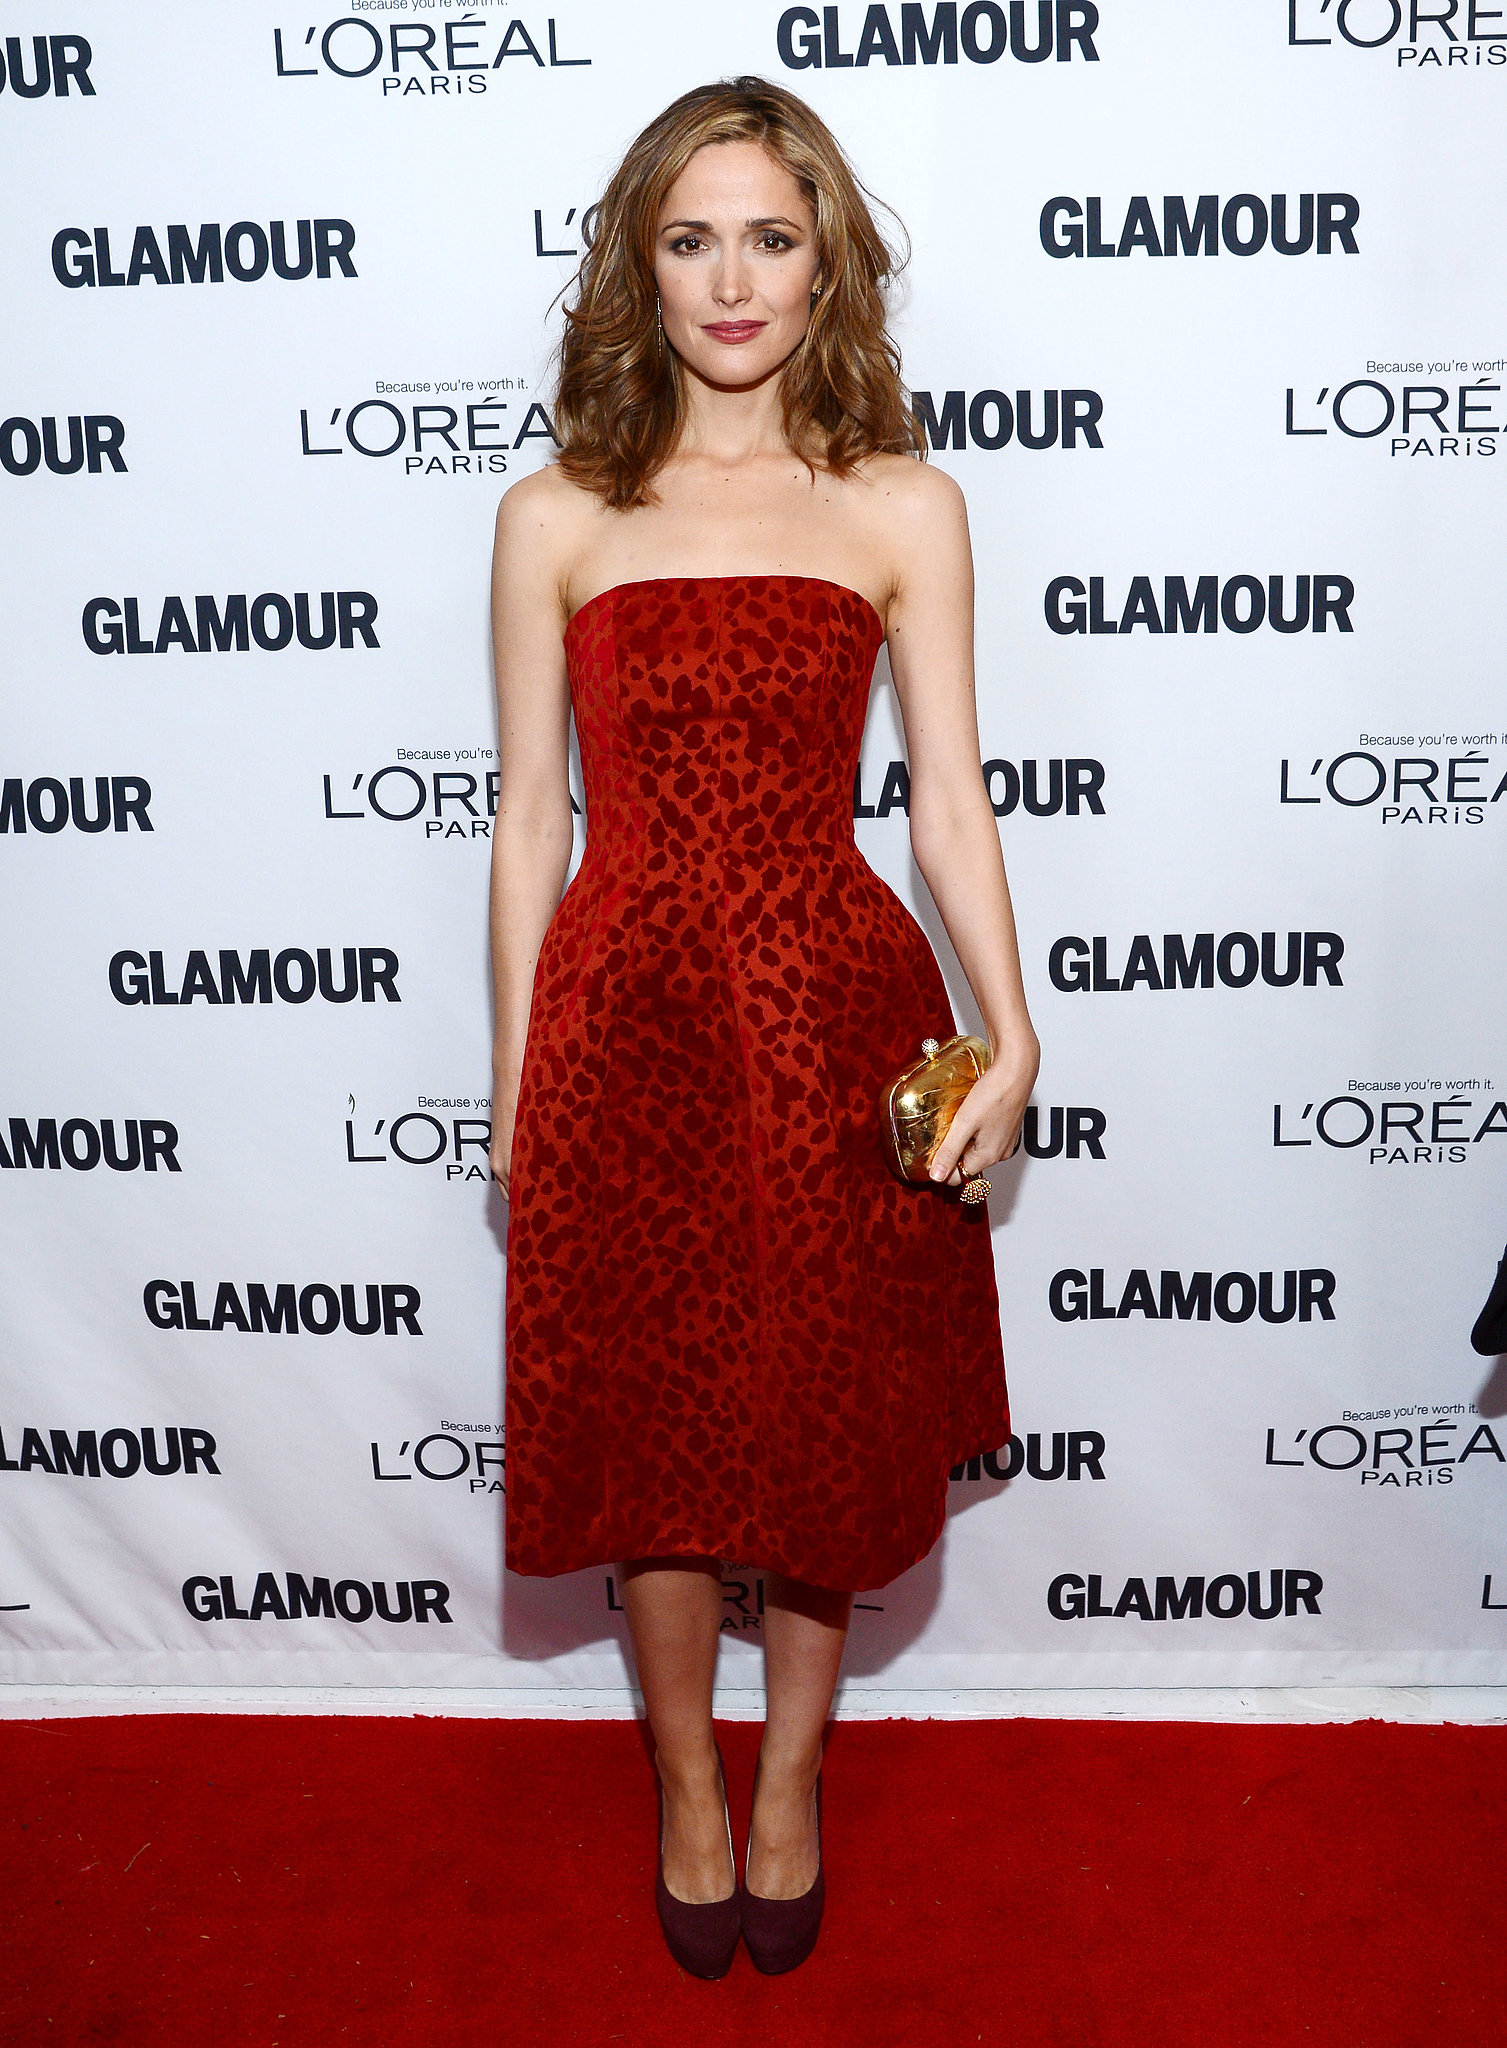 Red Carpet Cocktail Dresses